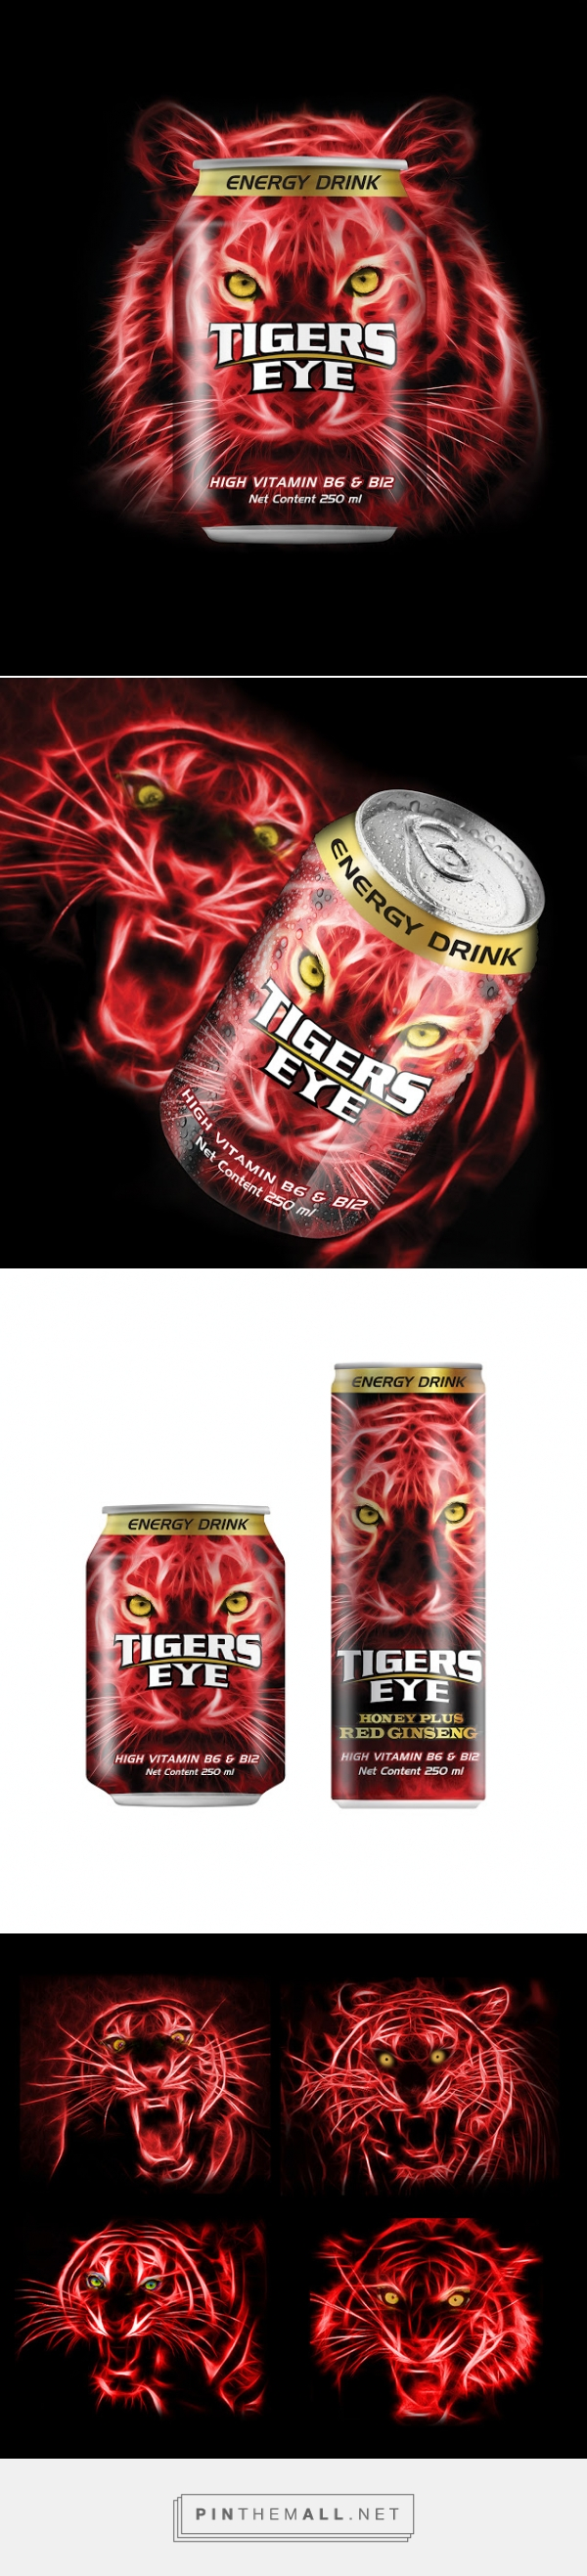 Tigers Eye Energydrink Packaging Designed By Prompt Design Http Www Packagingoftheworld C Packaging Design Inspiration Cosmetic Design Packaging Design